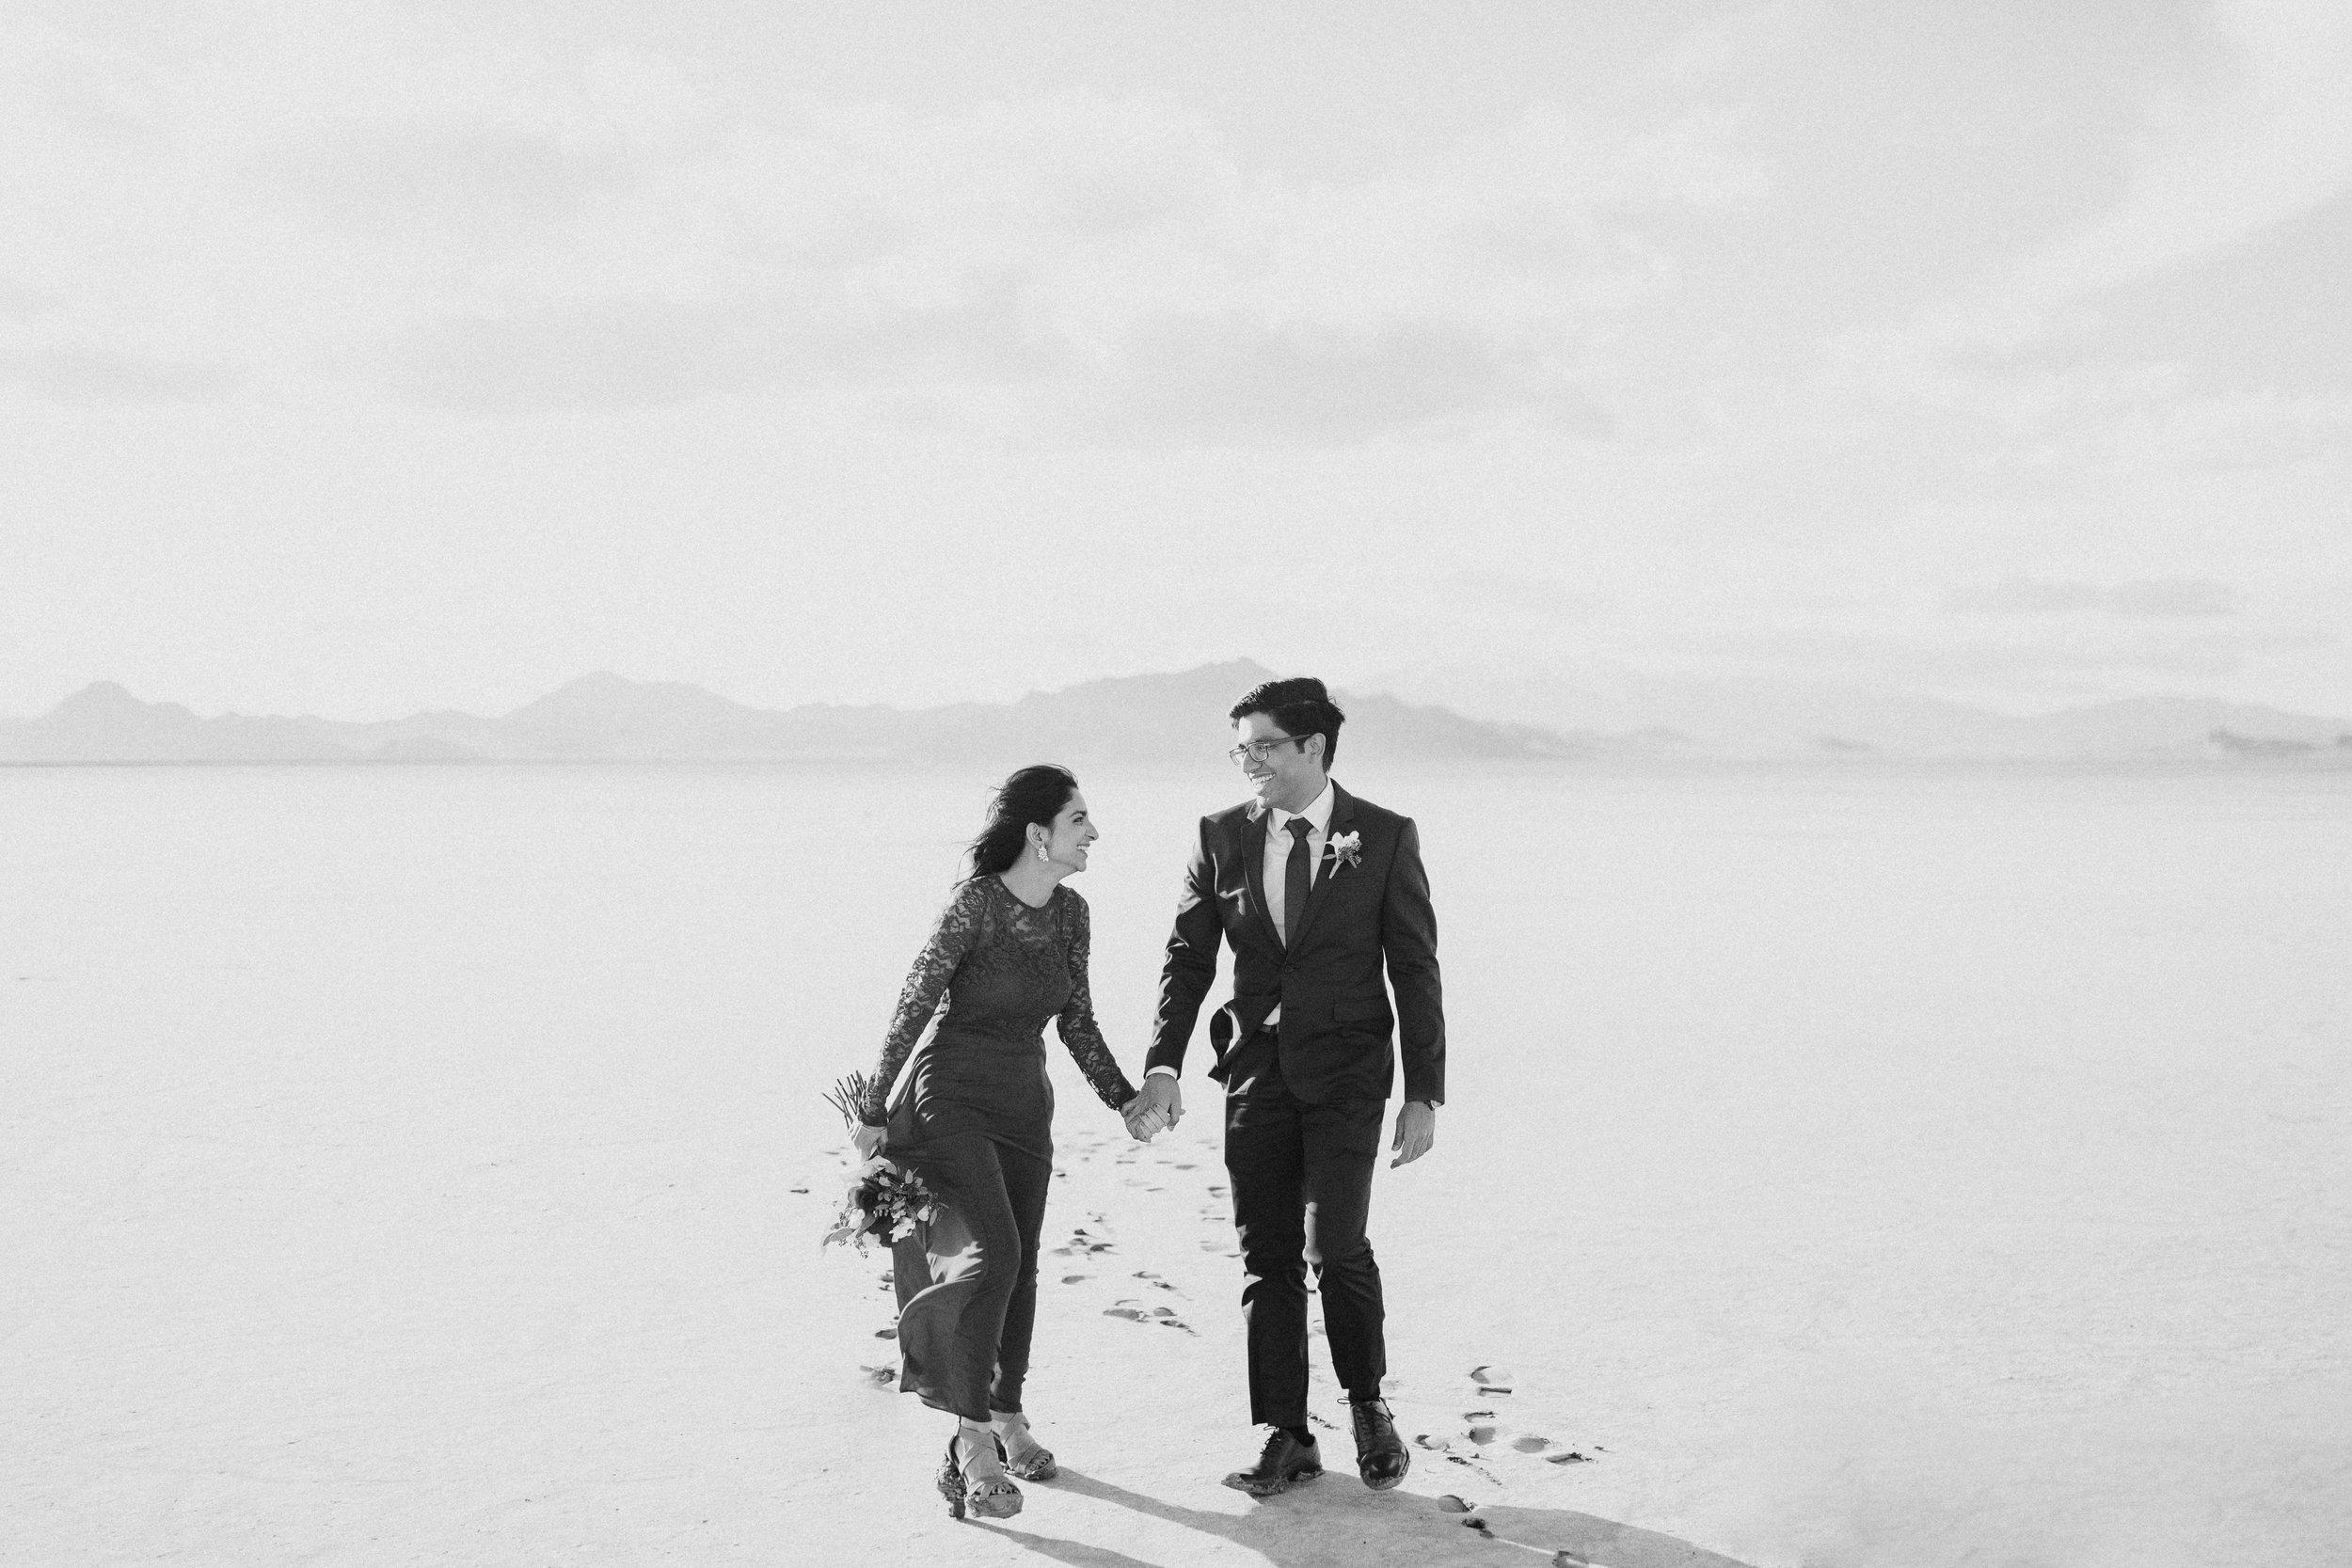 bonneville-salt-flats-engagement-couple-photos-destination-wedding-photography-4.jpg